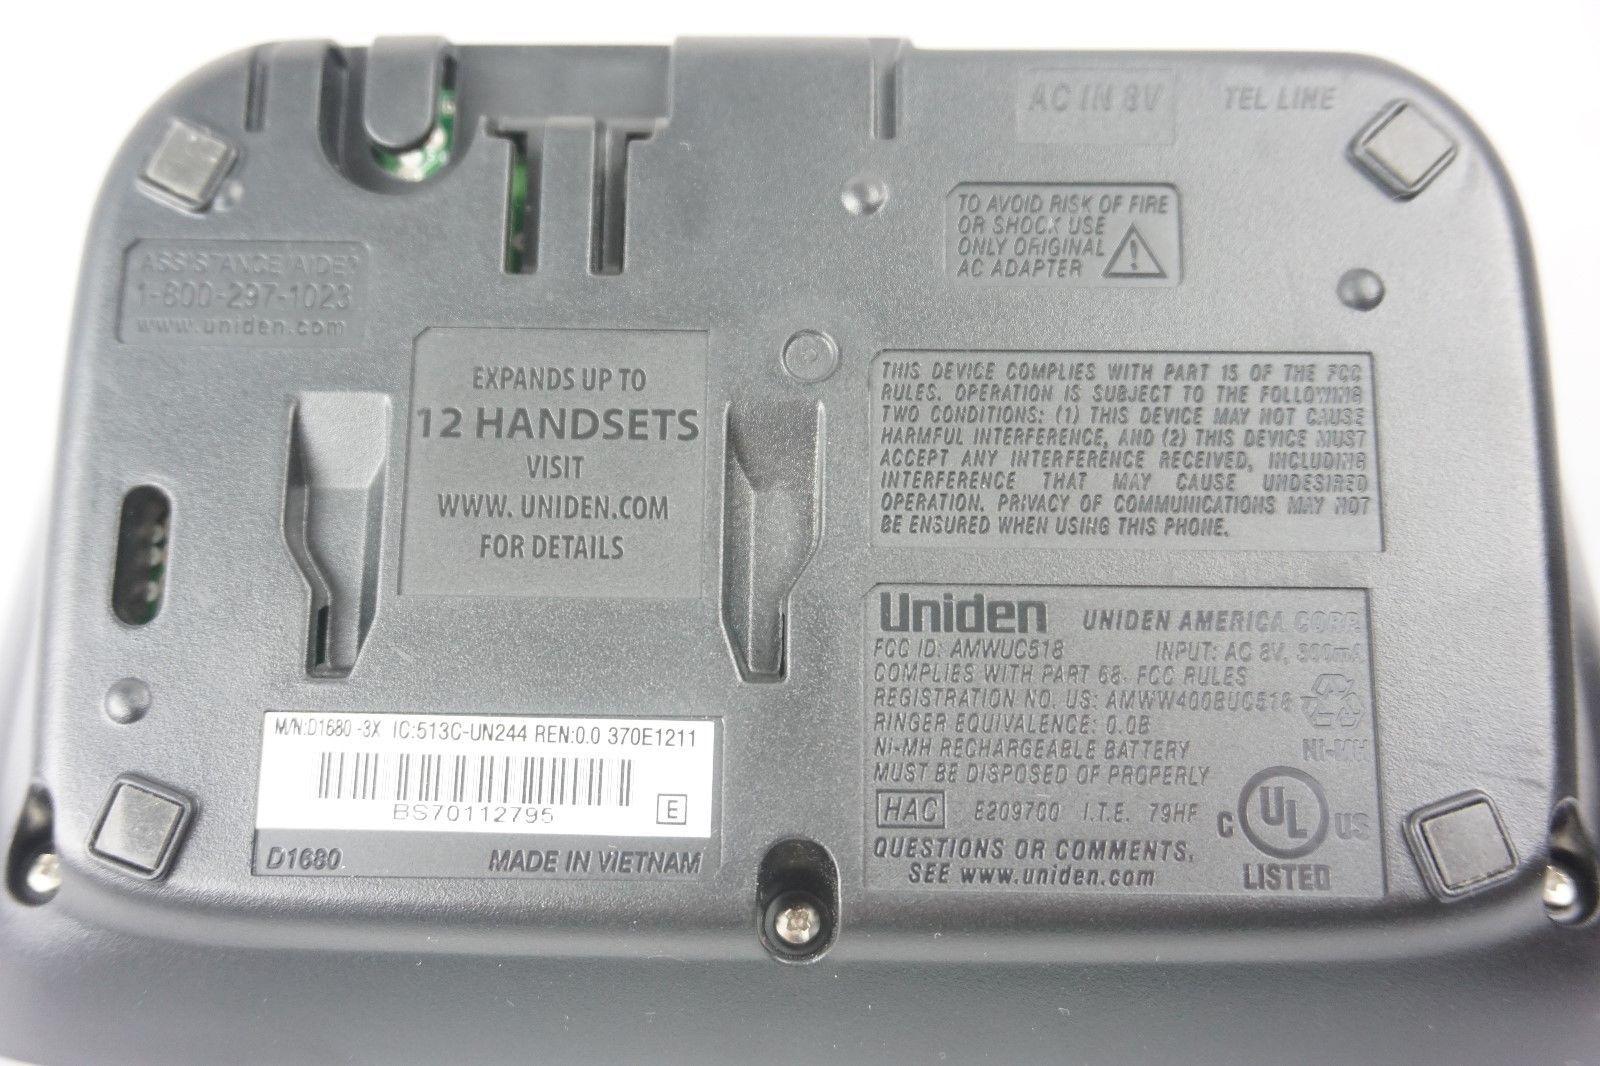 Uniden D1680-3 DECT 6.0 Cordless Phone Answering System 3 Handsets Expandable image 5